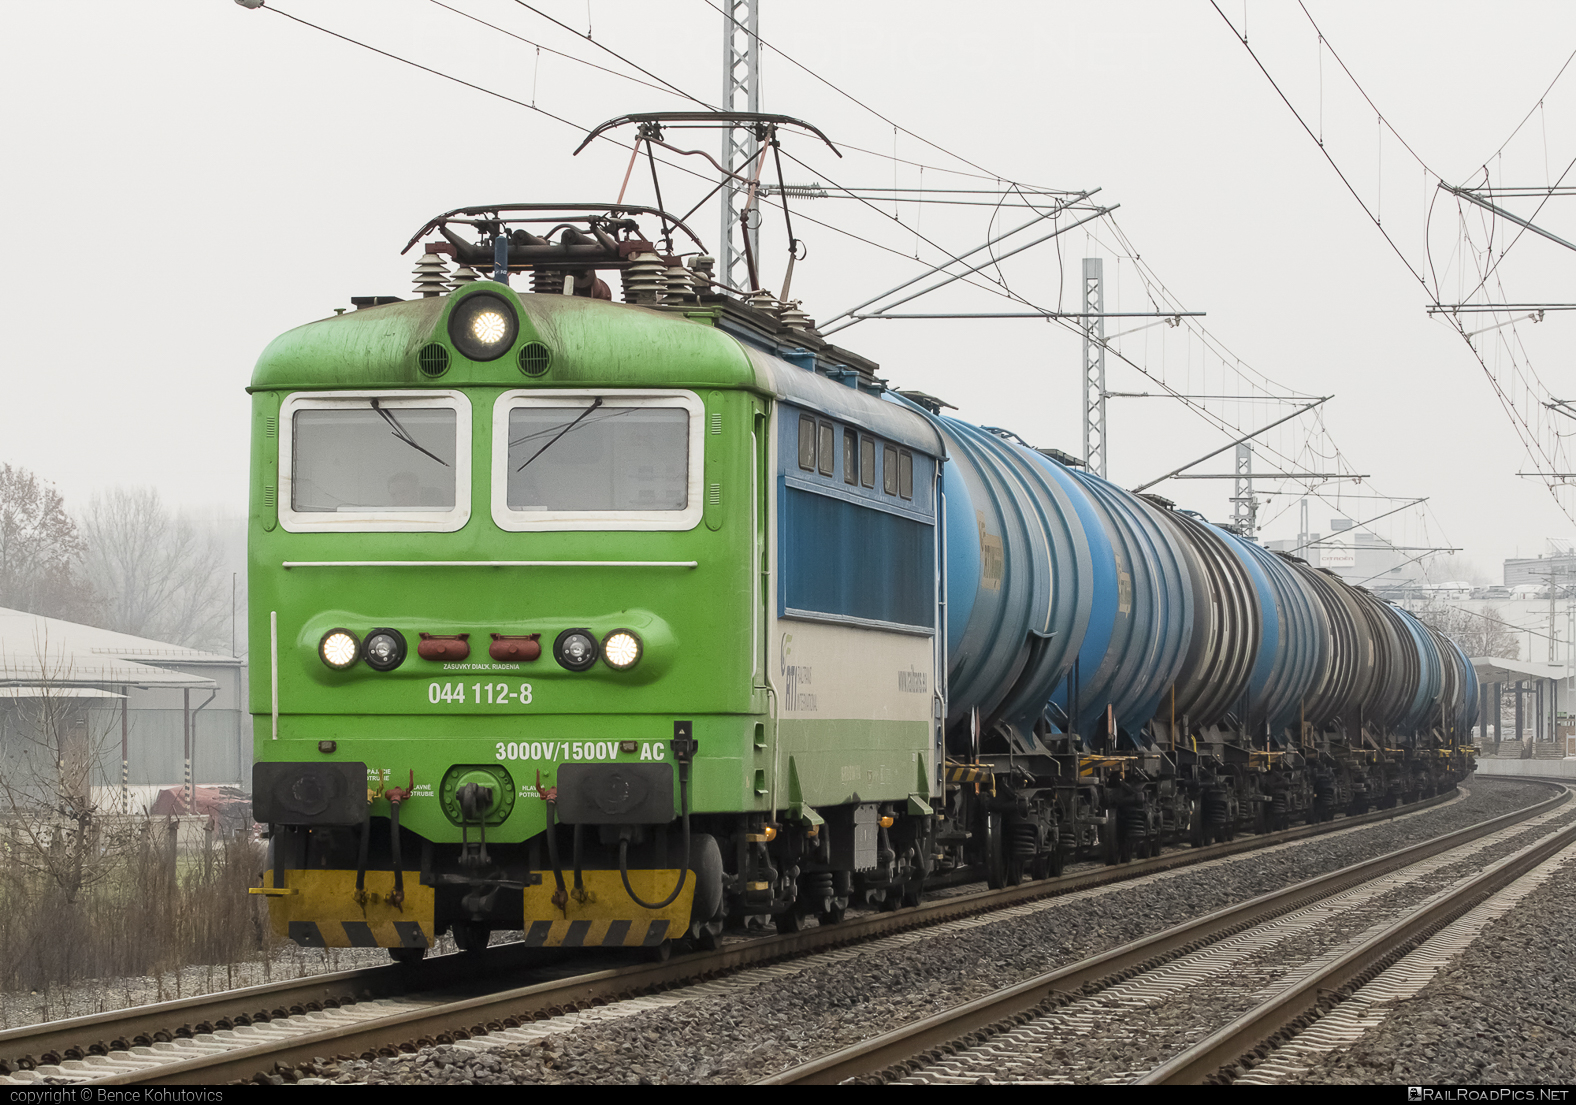 Škoda 73E - 044 112-8 operated by Railtrans International, s.r.o #RailtransInternational #kesselwagen #locomotive242 #plechac #rti #skoda #skoda73e #tankwagon